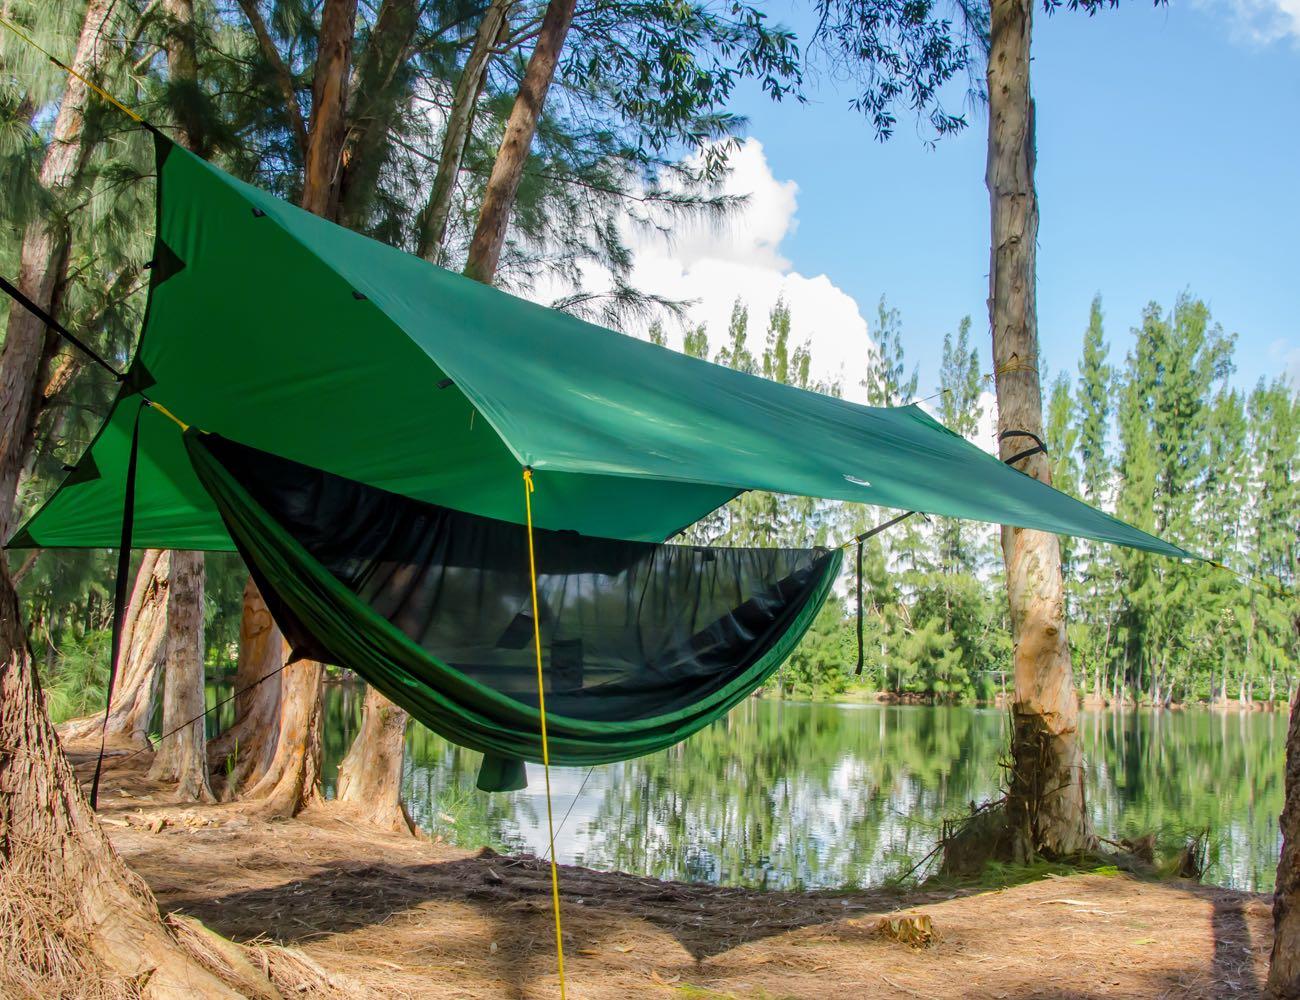 Apex Camping Shelter & Hammock Camping Tarp for Everyone ...